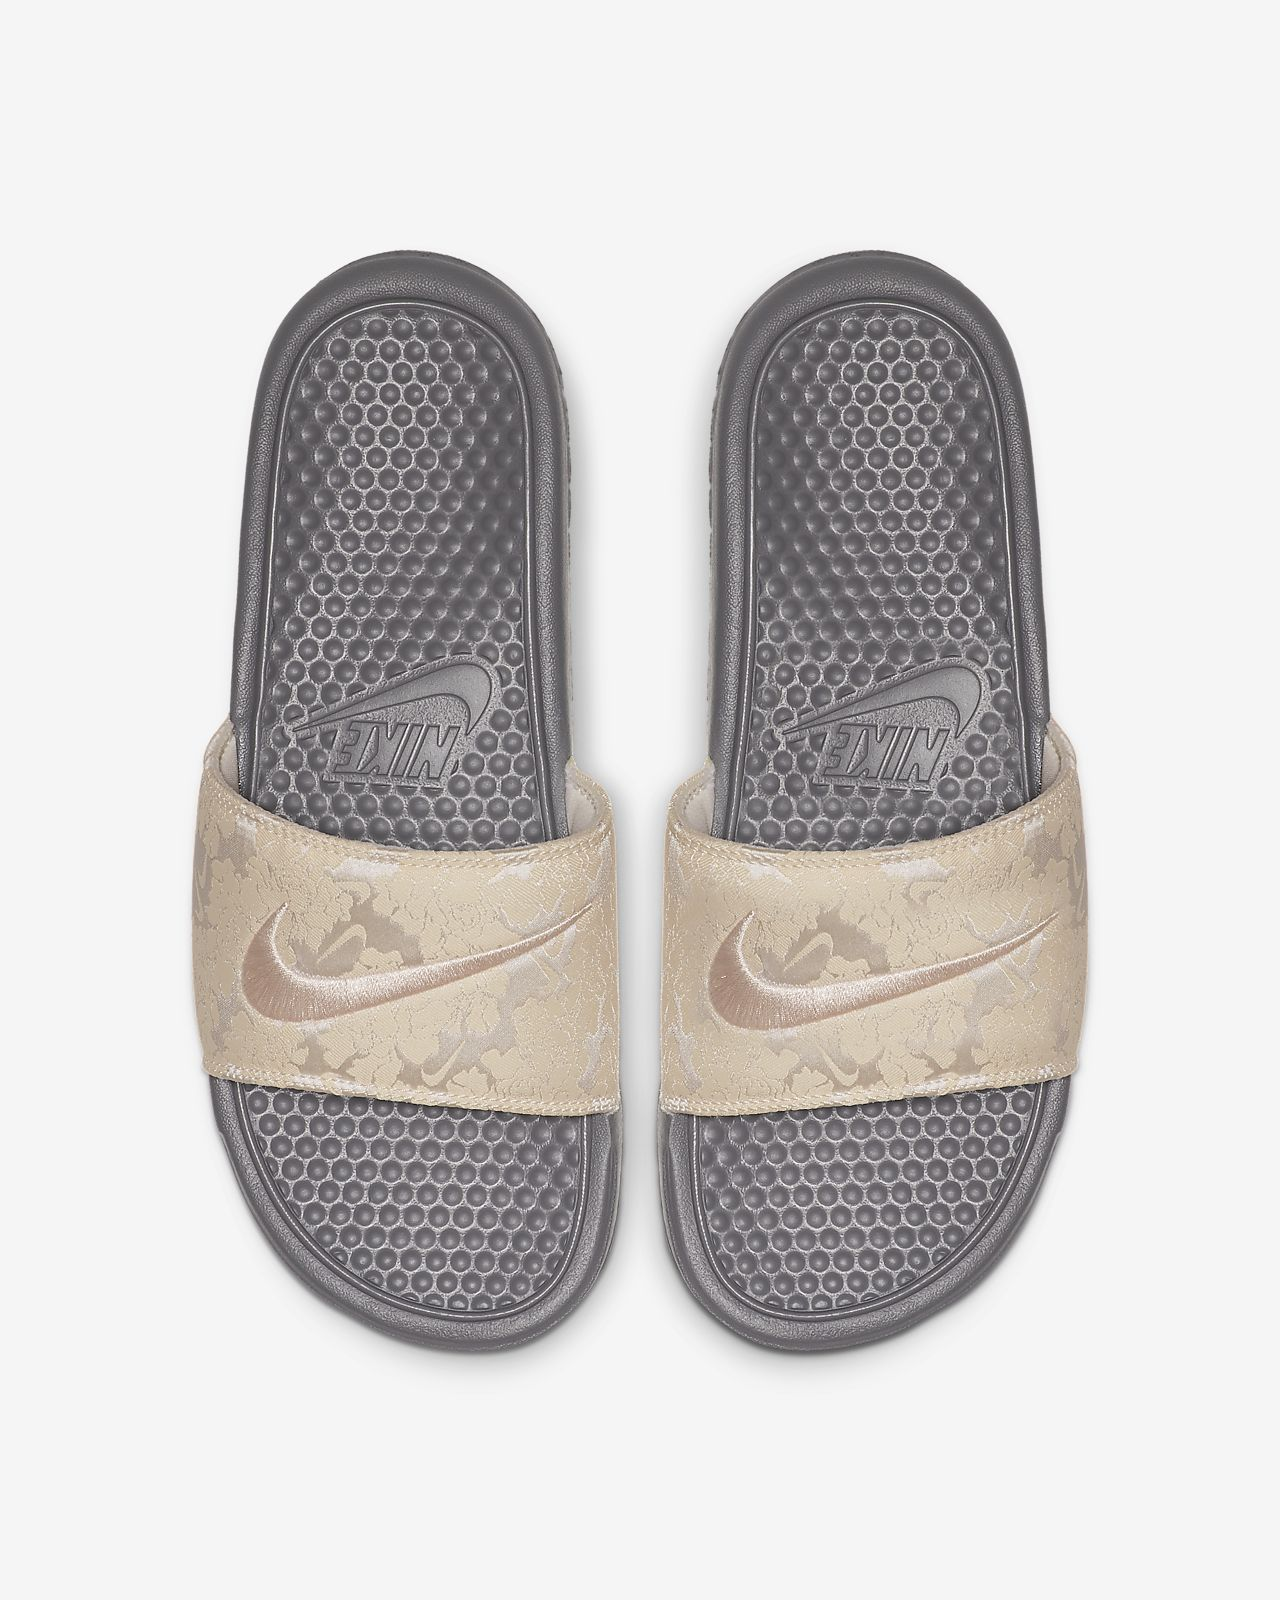 Nike Benassi JDI TXT SE-badesandal til kvinder